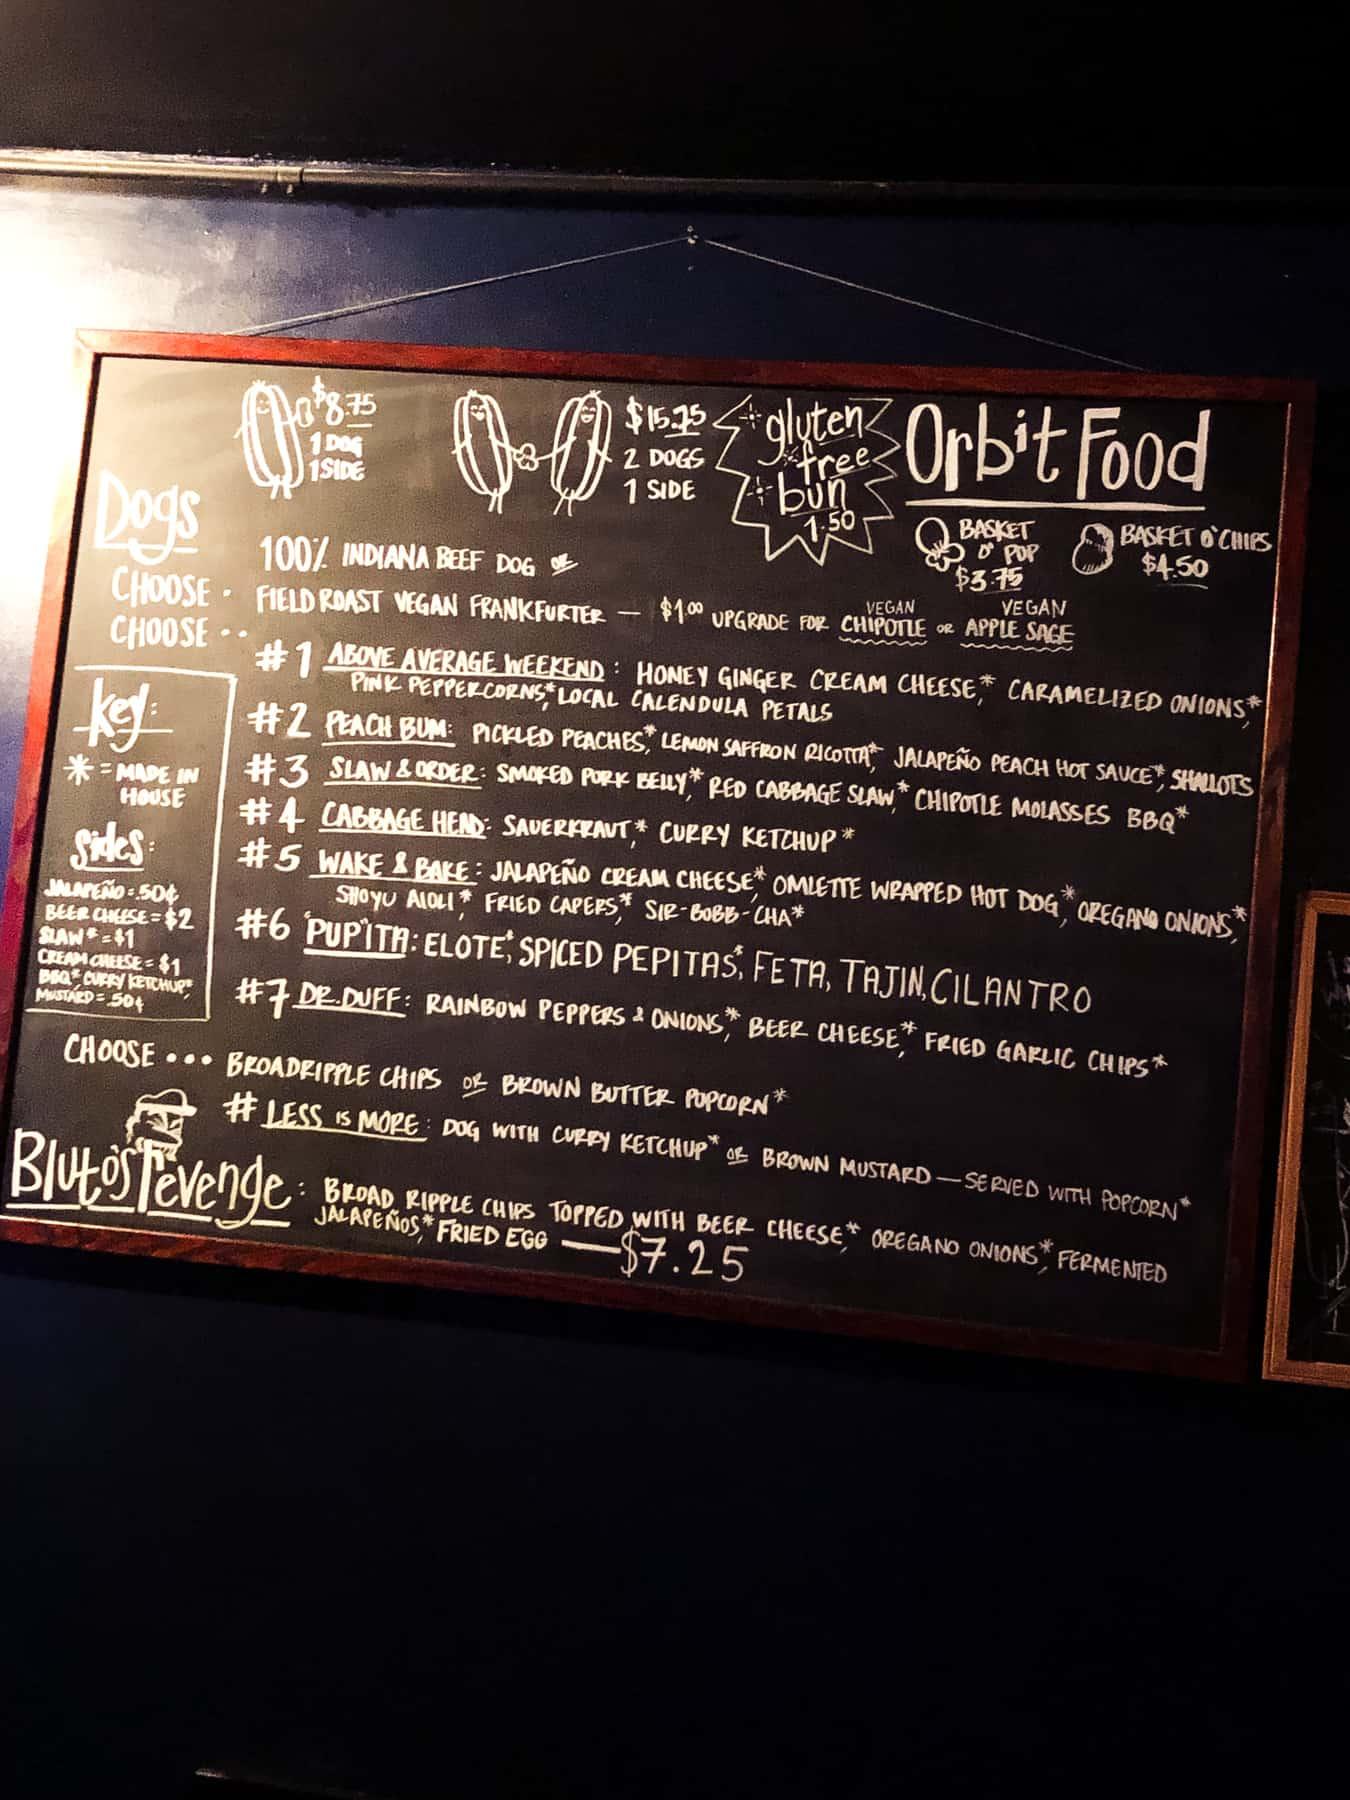 Chalkboard menu hanging up at the Orbit Room in Bloomington, Indiana.